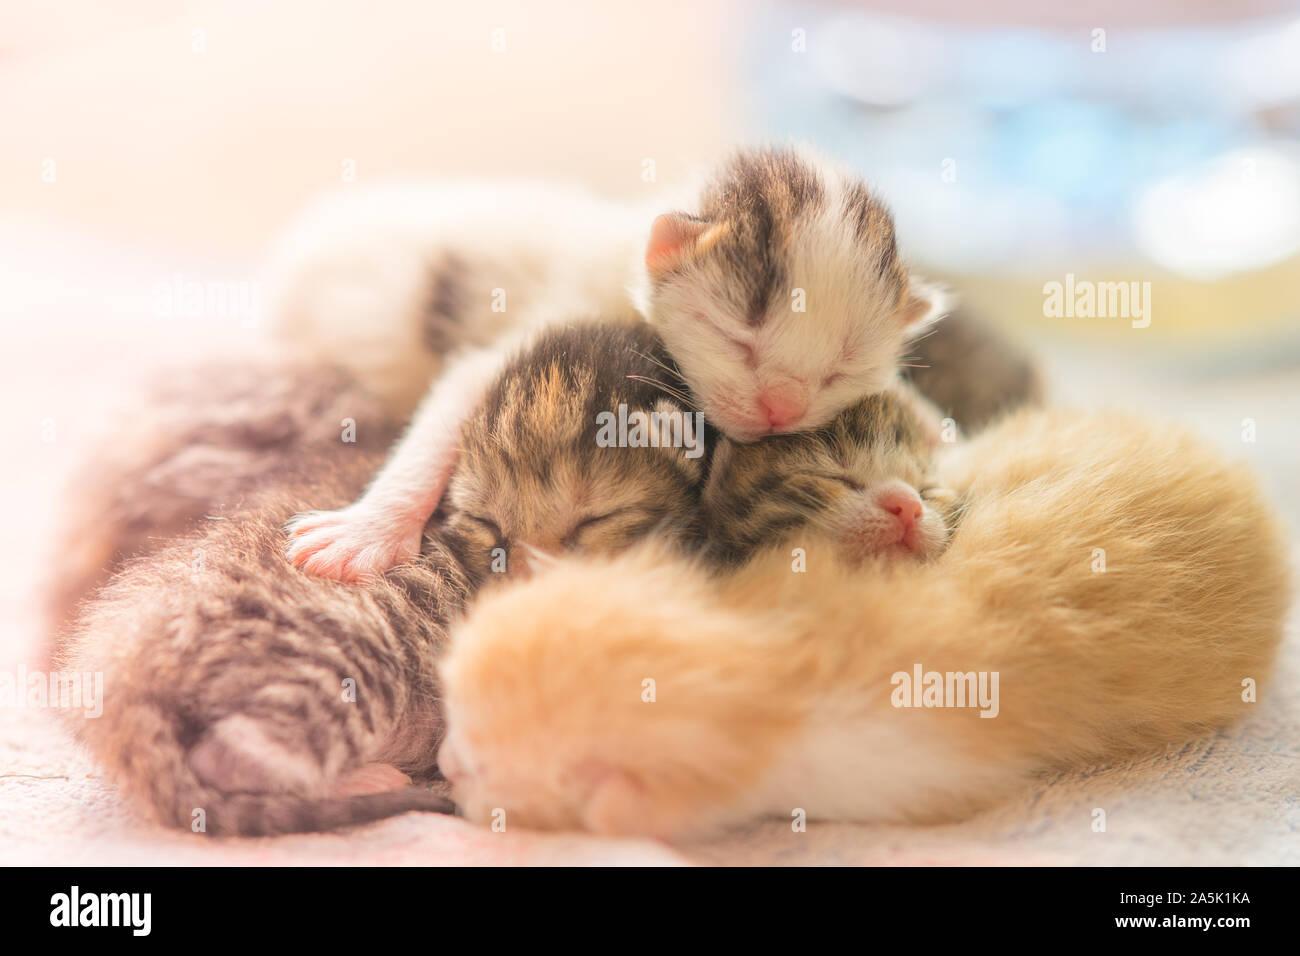 Newborn Kittens Sleeping Cute Baby Animals Sleep Stock Photo Alamy